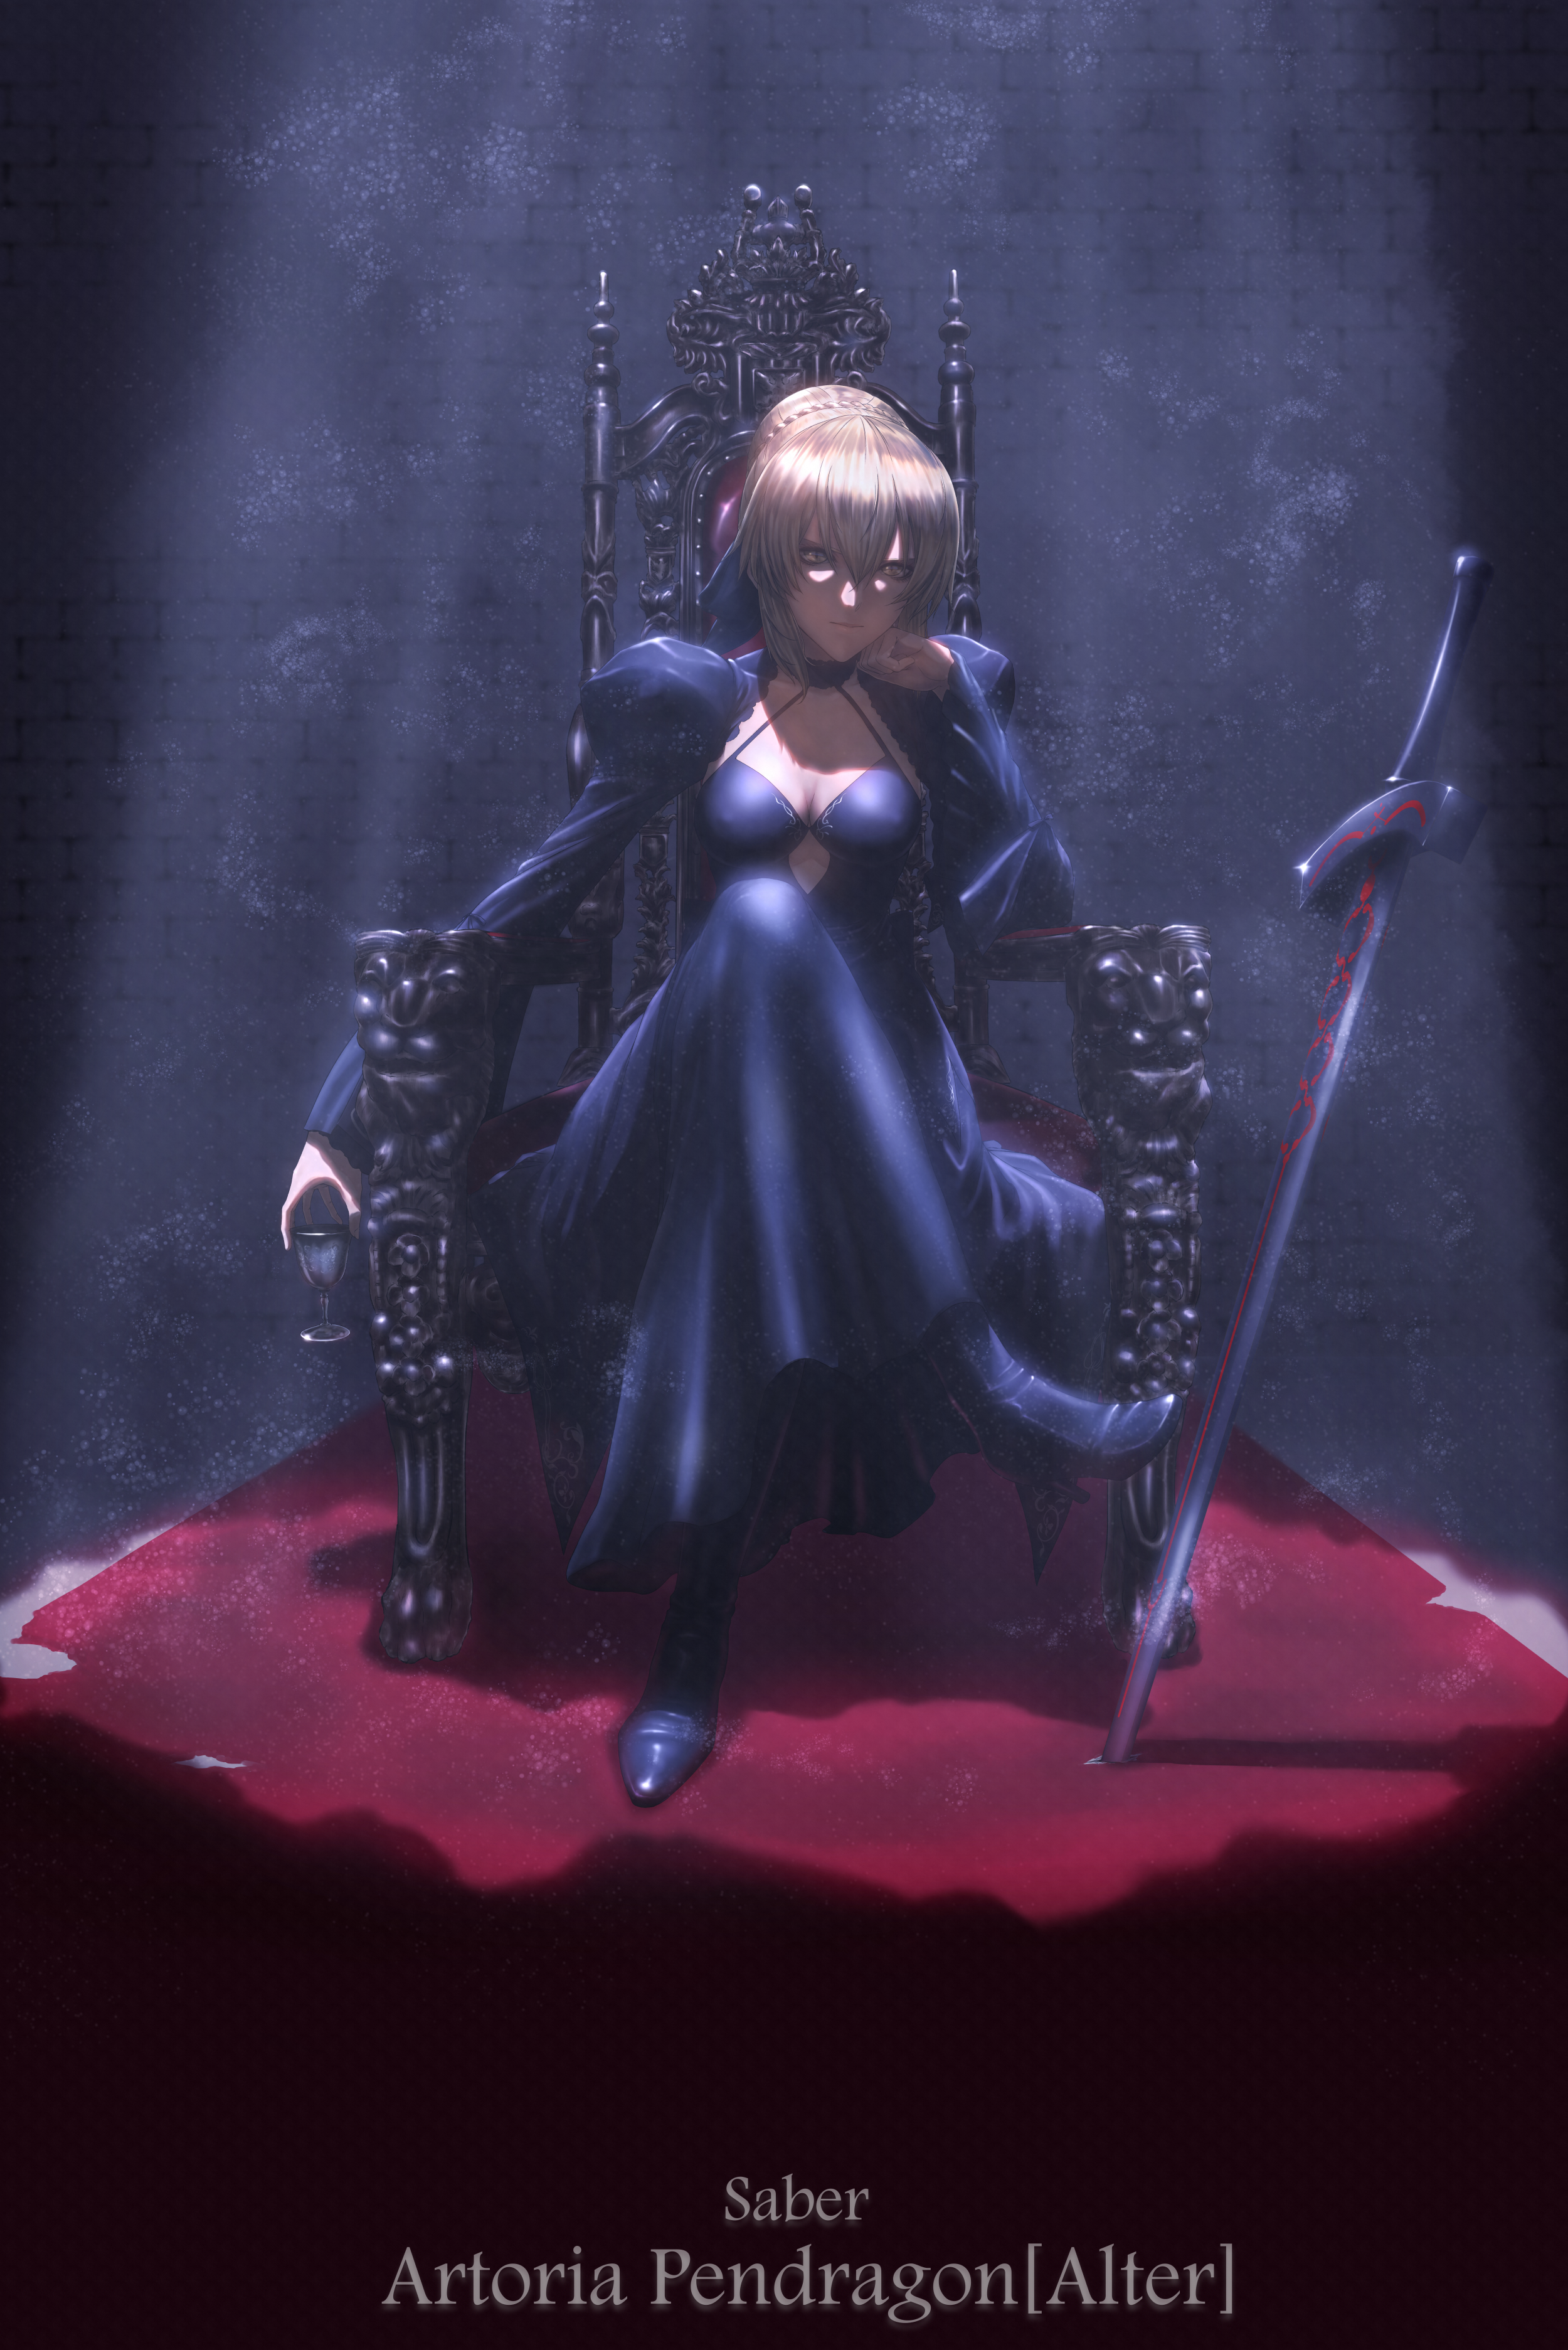 Fate Series Fate Stay Night Fate Stay Night Heavens Feel Black Dress Blonde Female Warrior Sitting F 2500x3746